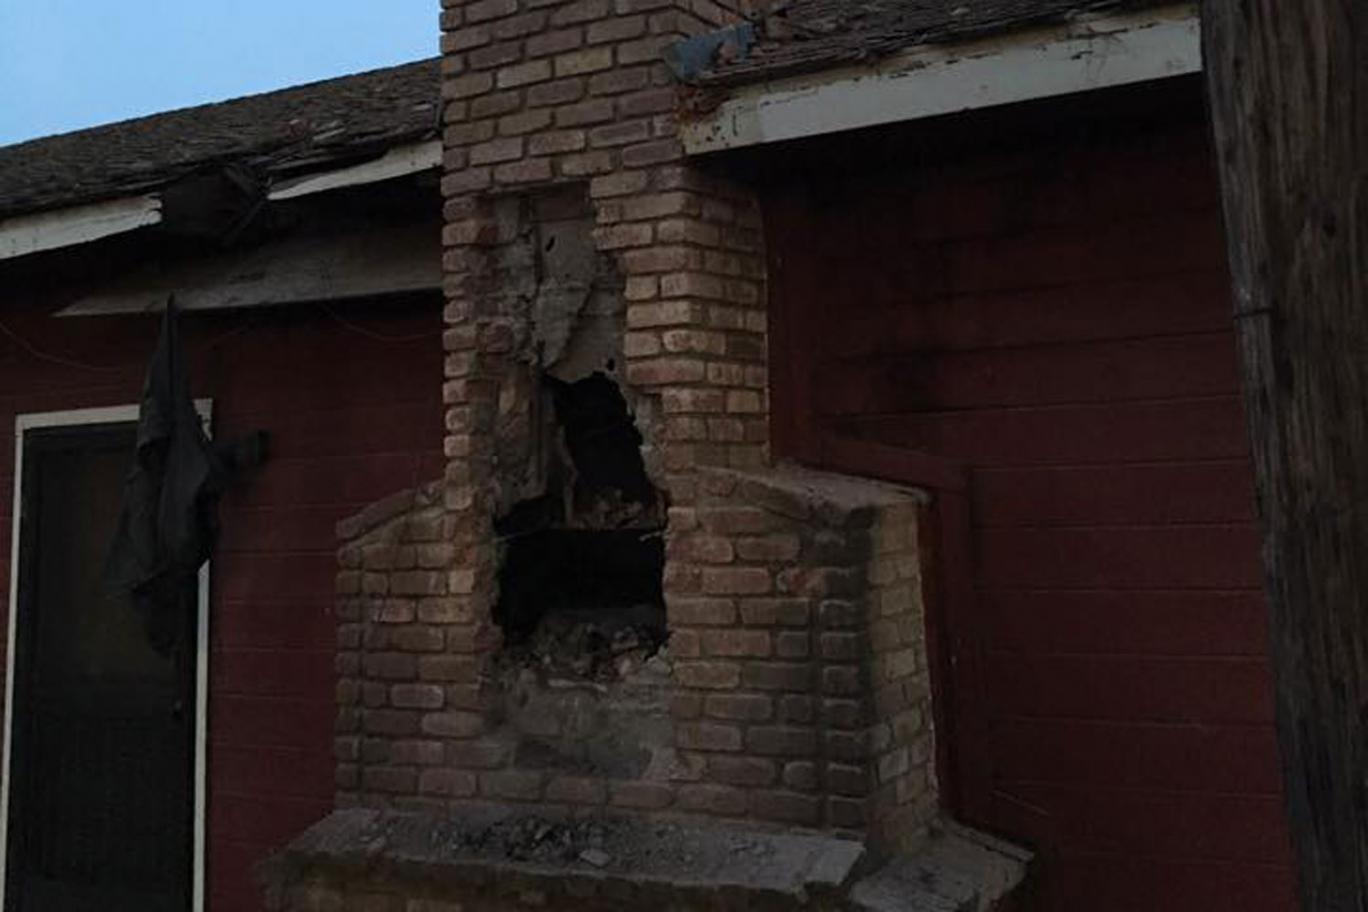 Burglary suspect stuck in chimney dies after homeowner sets fire